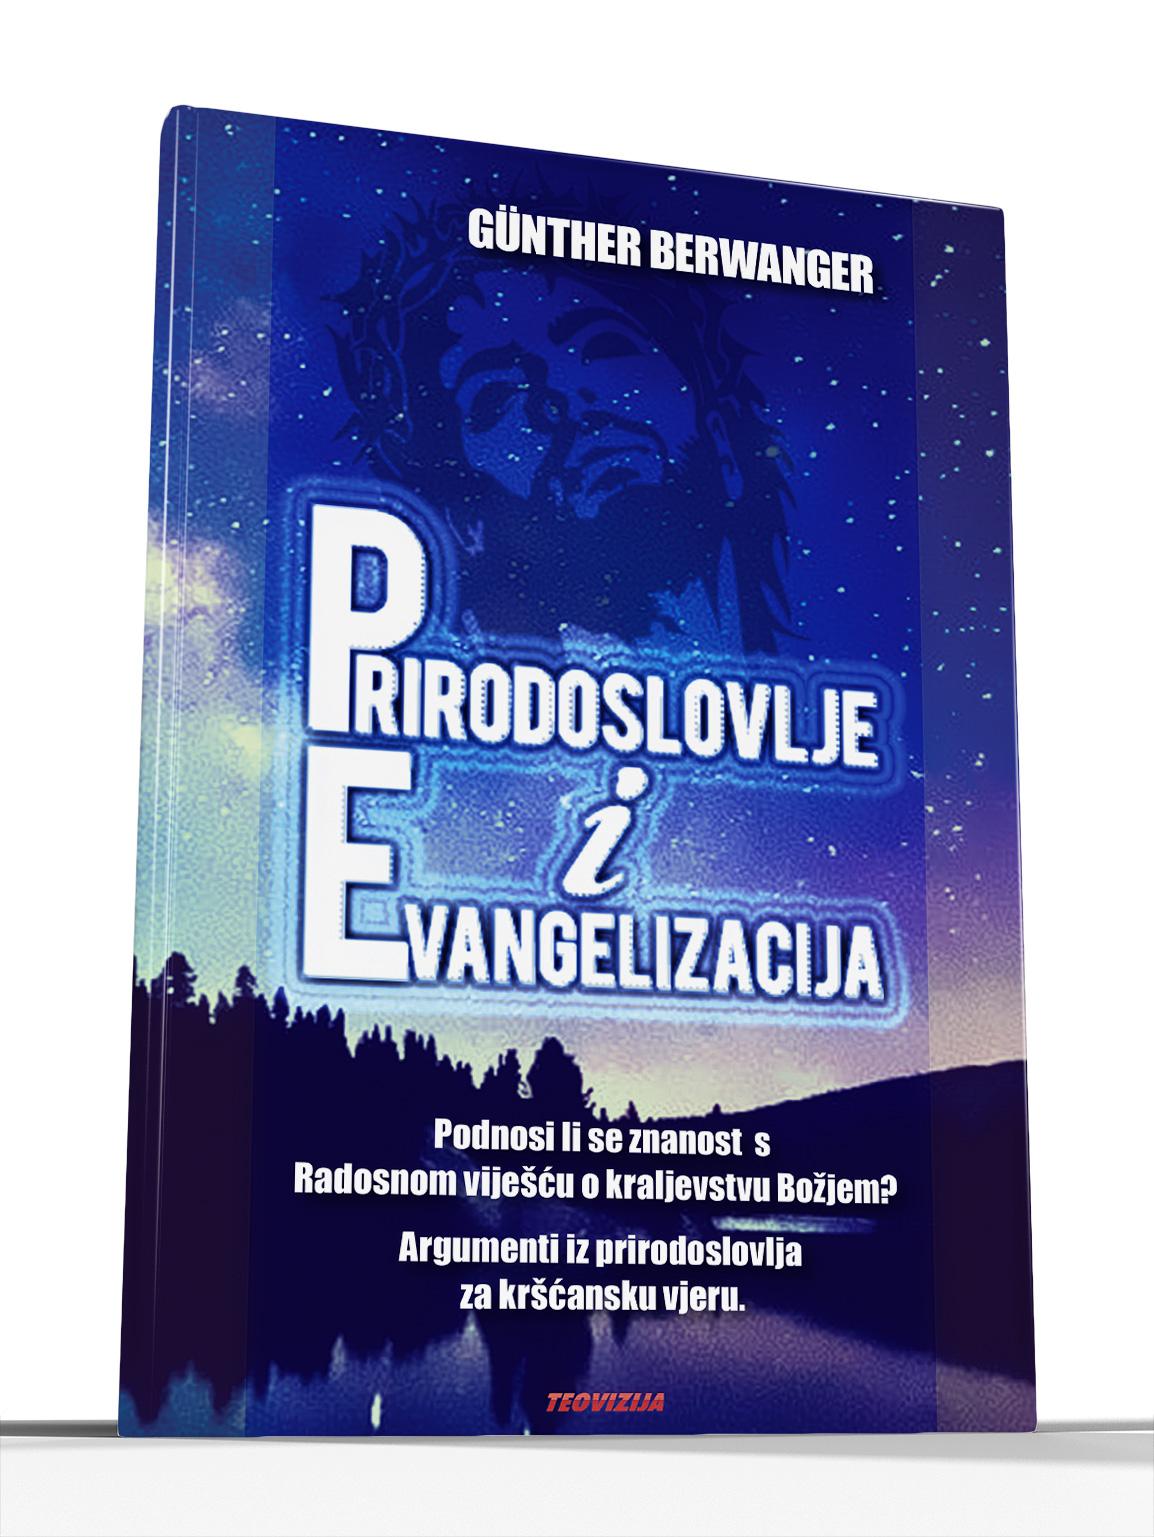 PRIRODOSLOVLJE  I EVANGELIZACIJA - Günther Berwanger